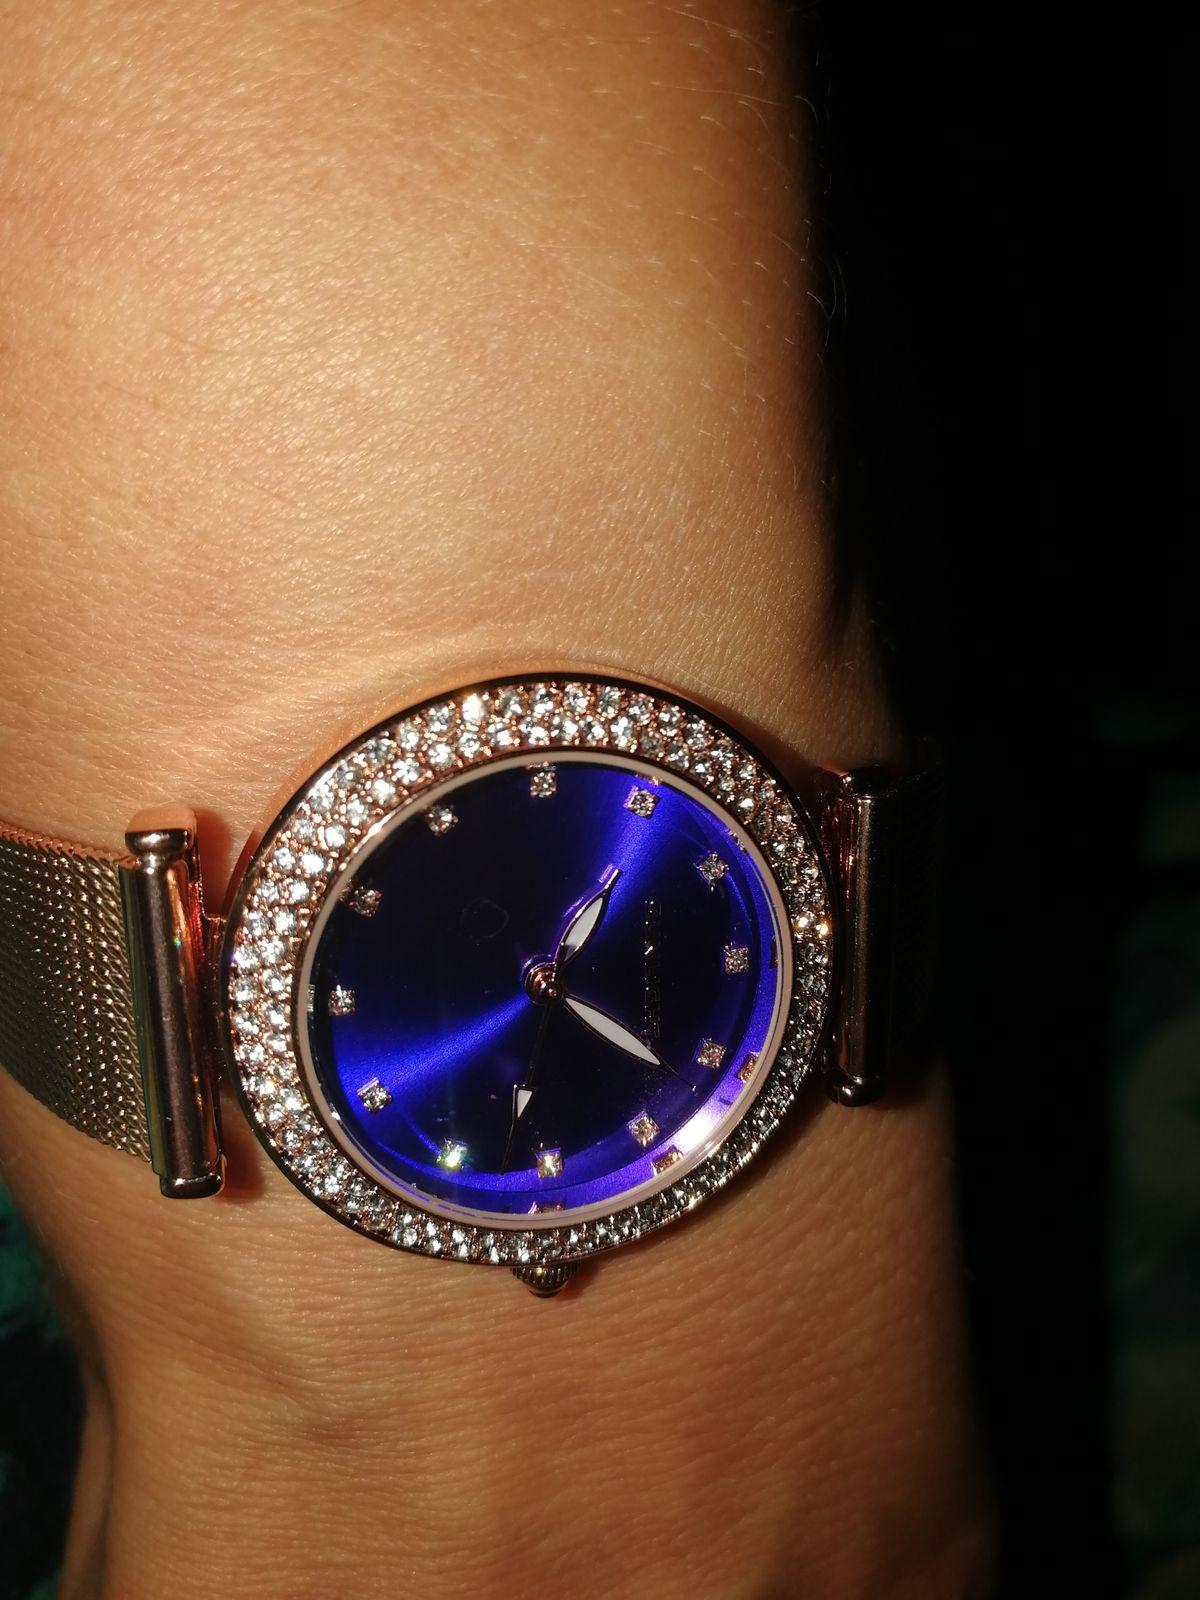 Шикарные часы за приятную цену 🥰👍